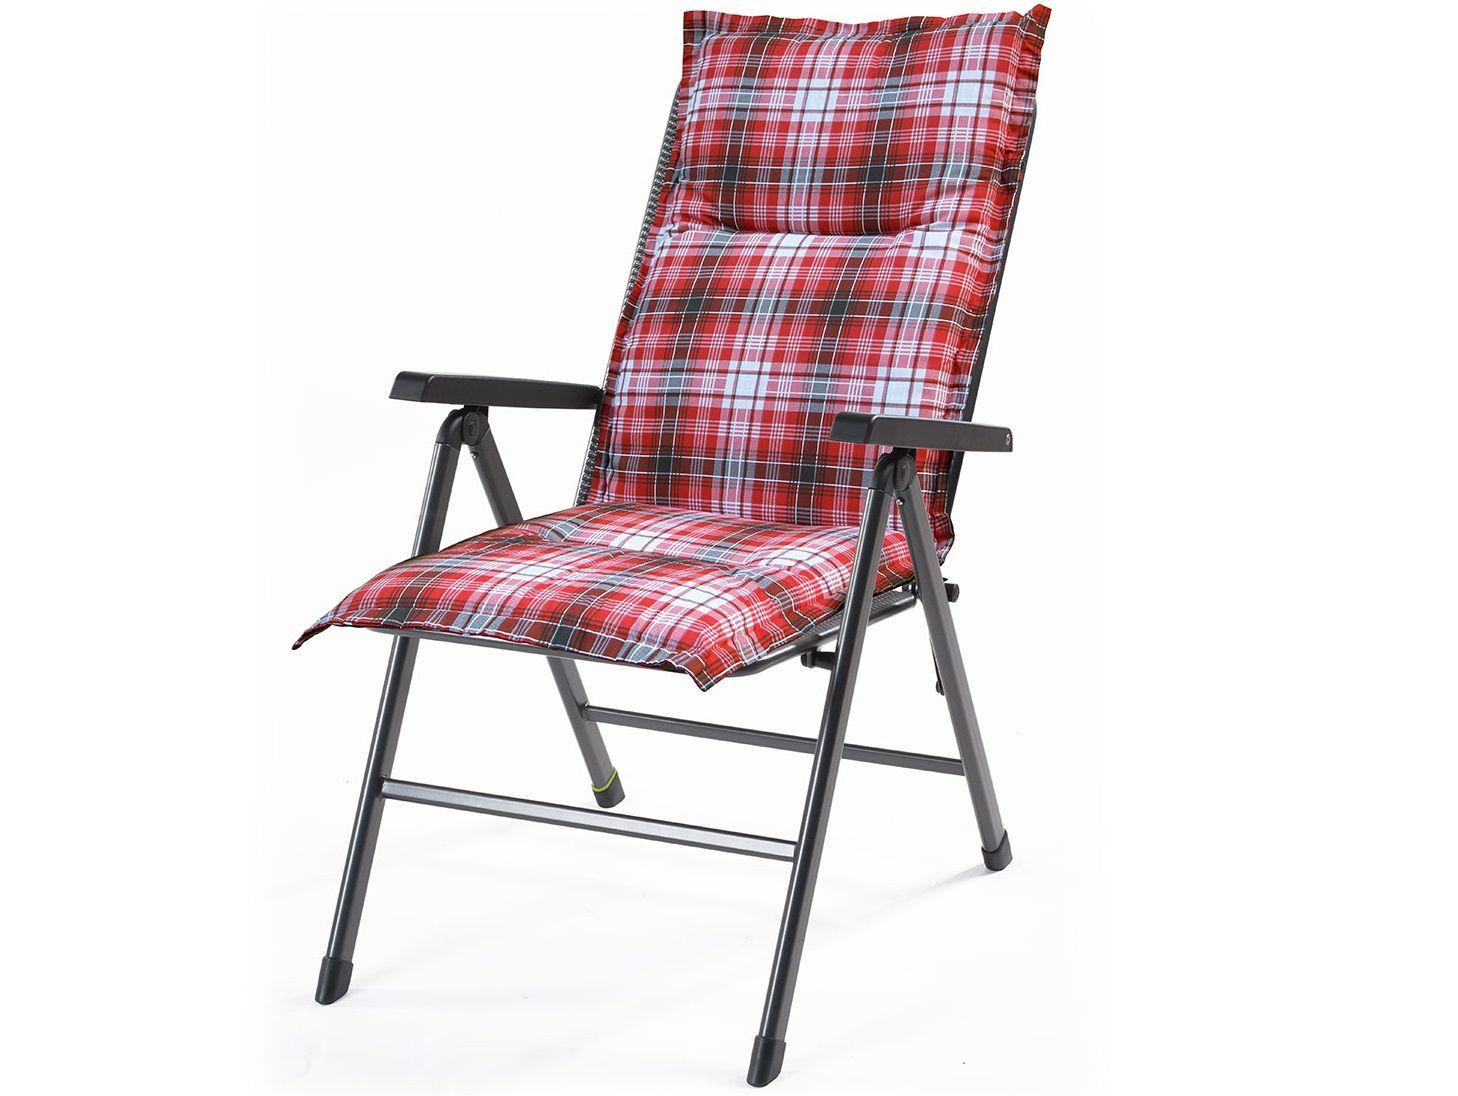 Polstr pro klasické židle Creador Hartman red - 100 x 50 x 6 cm (HTM-red-100x50x6)